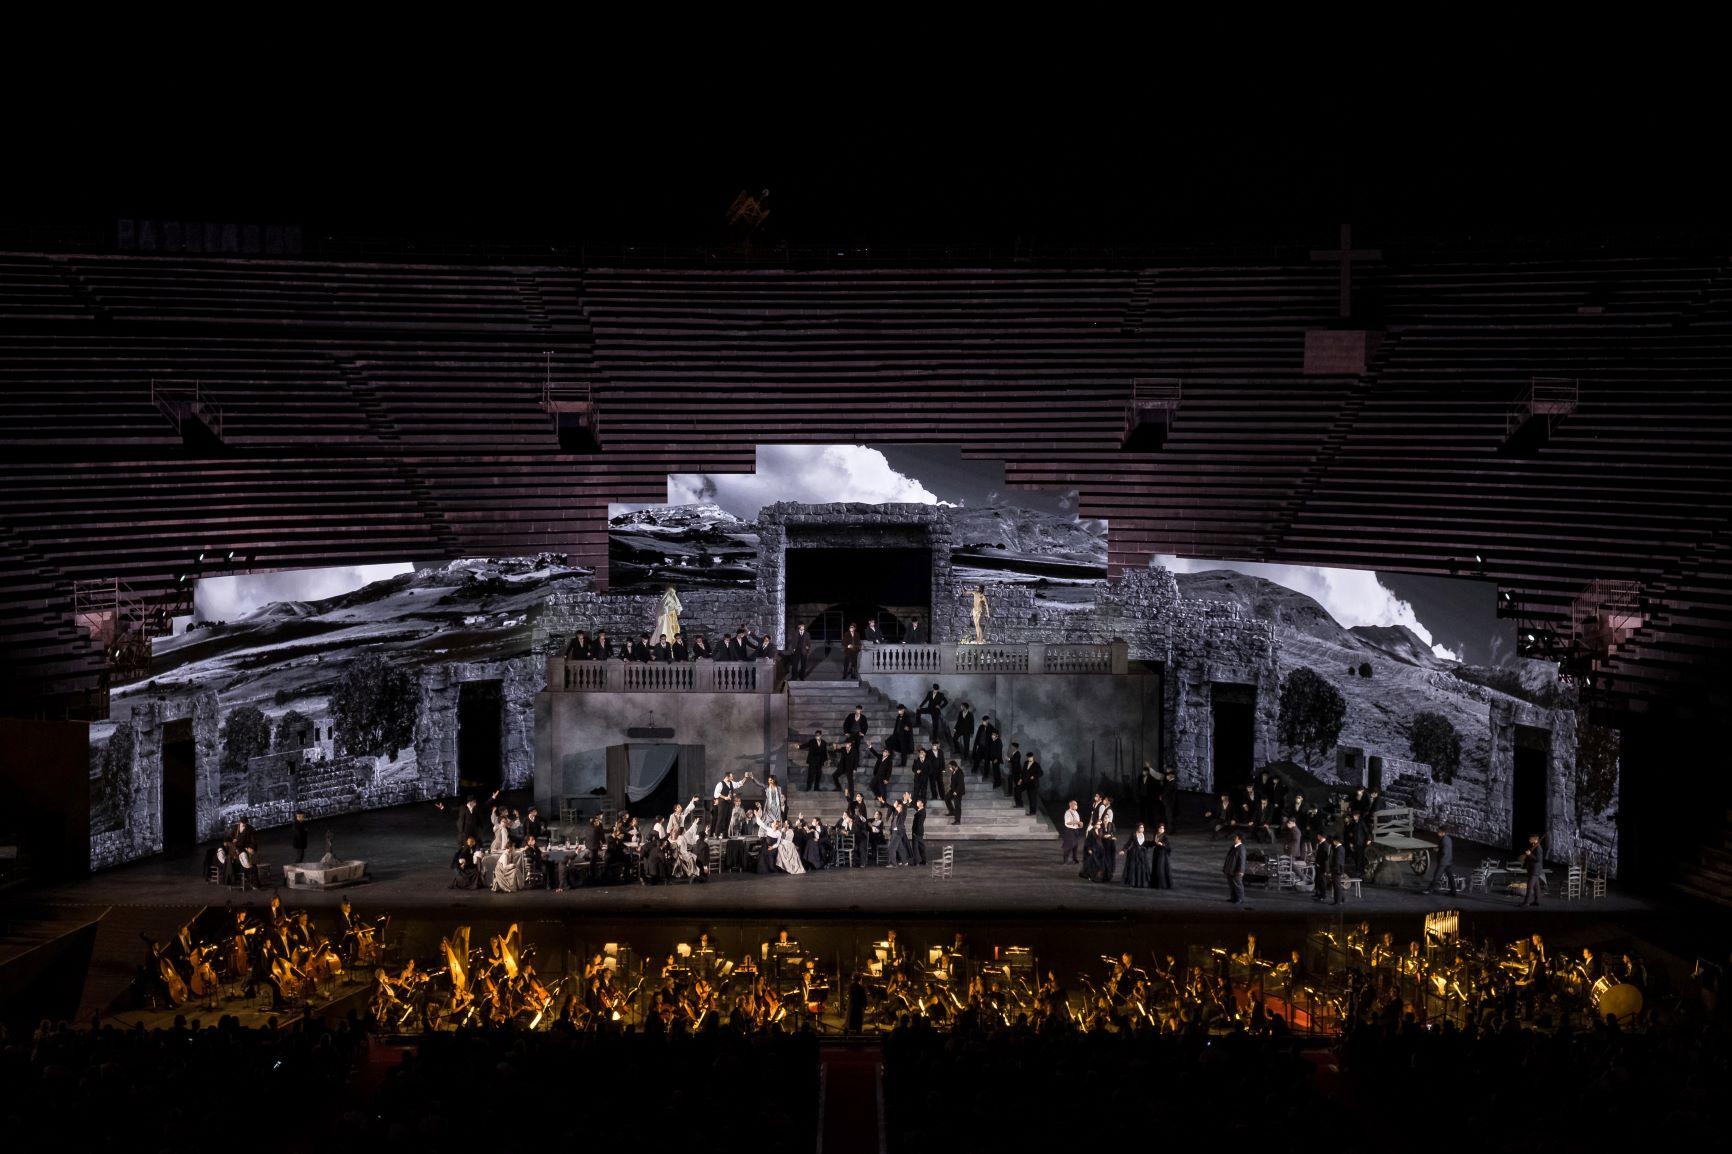 Verona en 3D: ¿Tiene futuro la ópera digital?